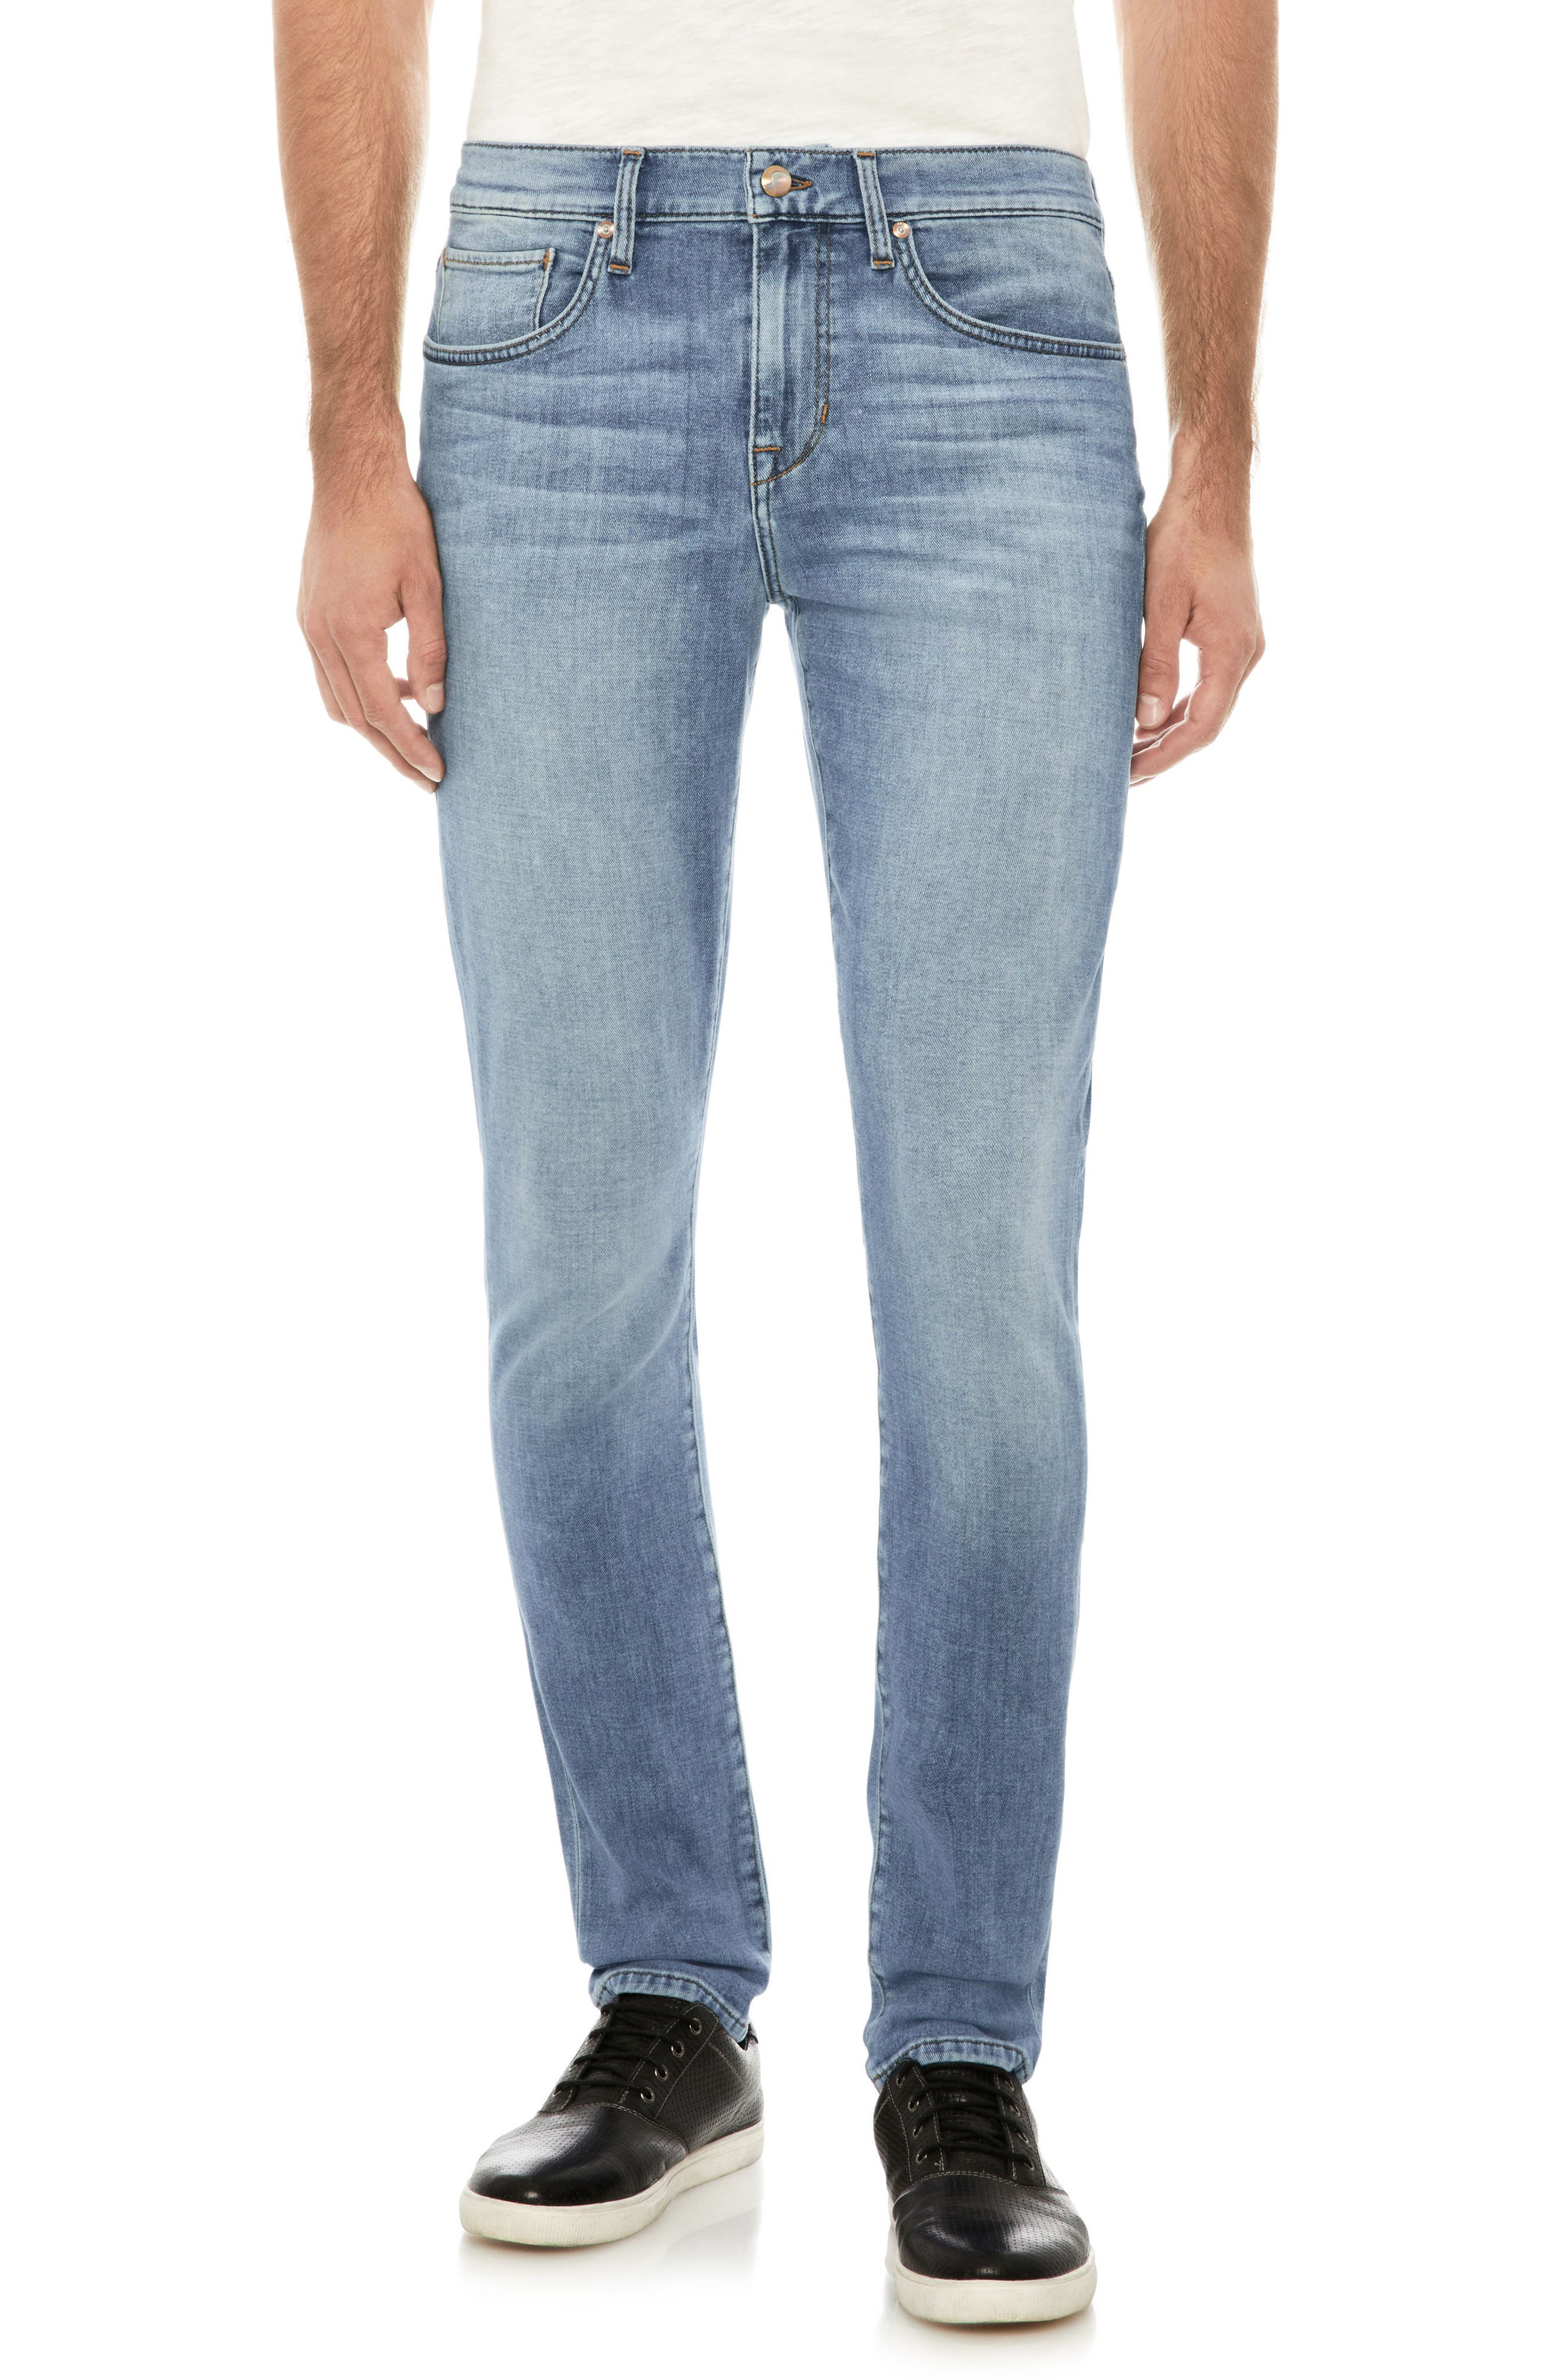 Legend Skinny Fit Jeans,                             Main thumbnail 1, color,